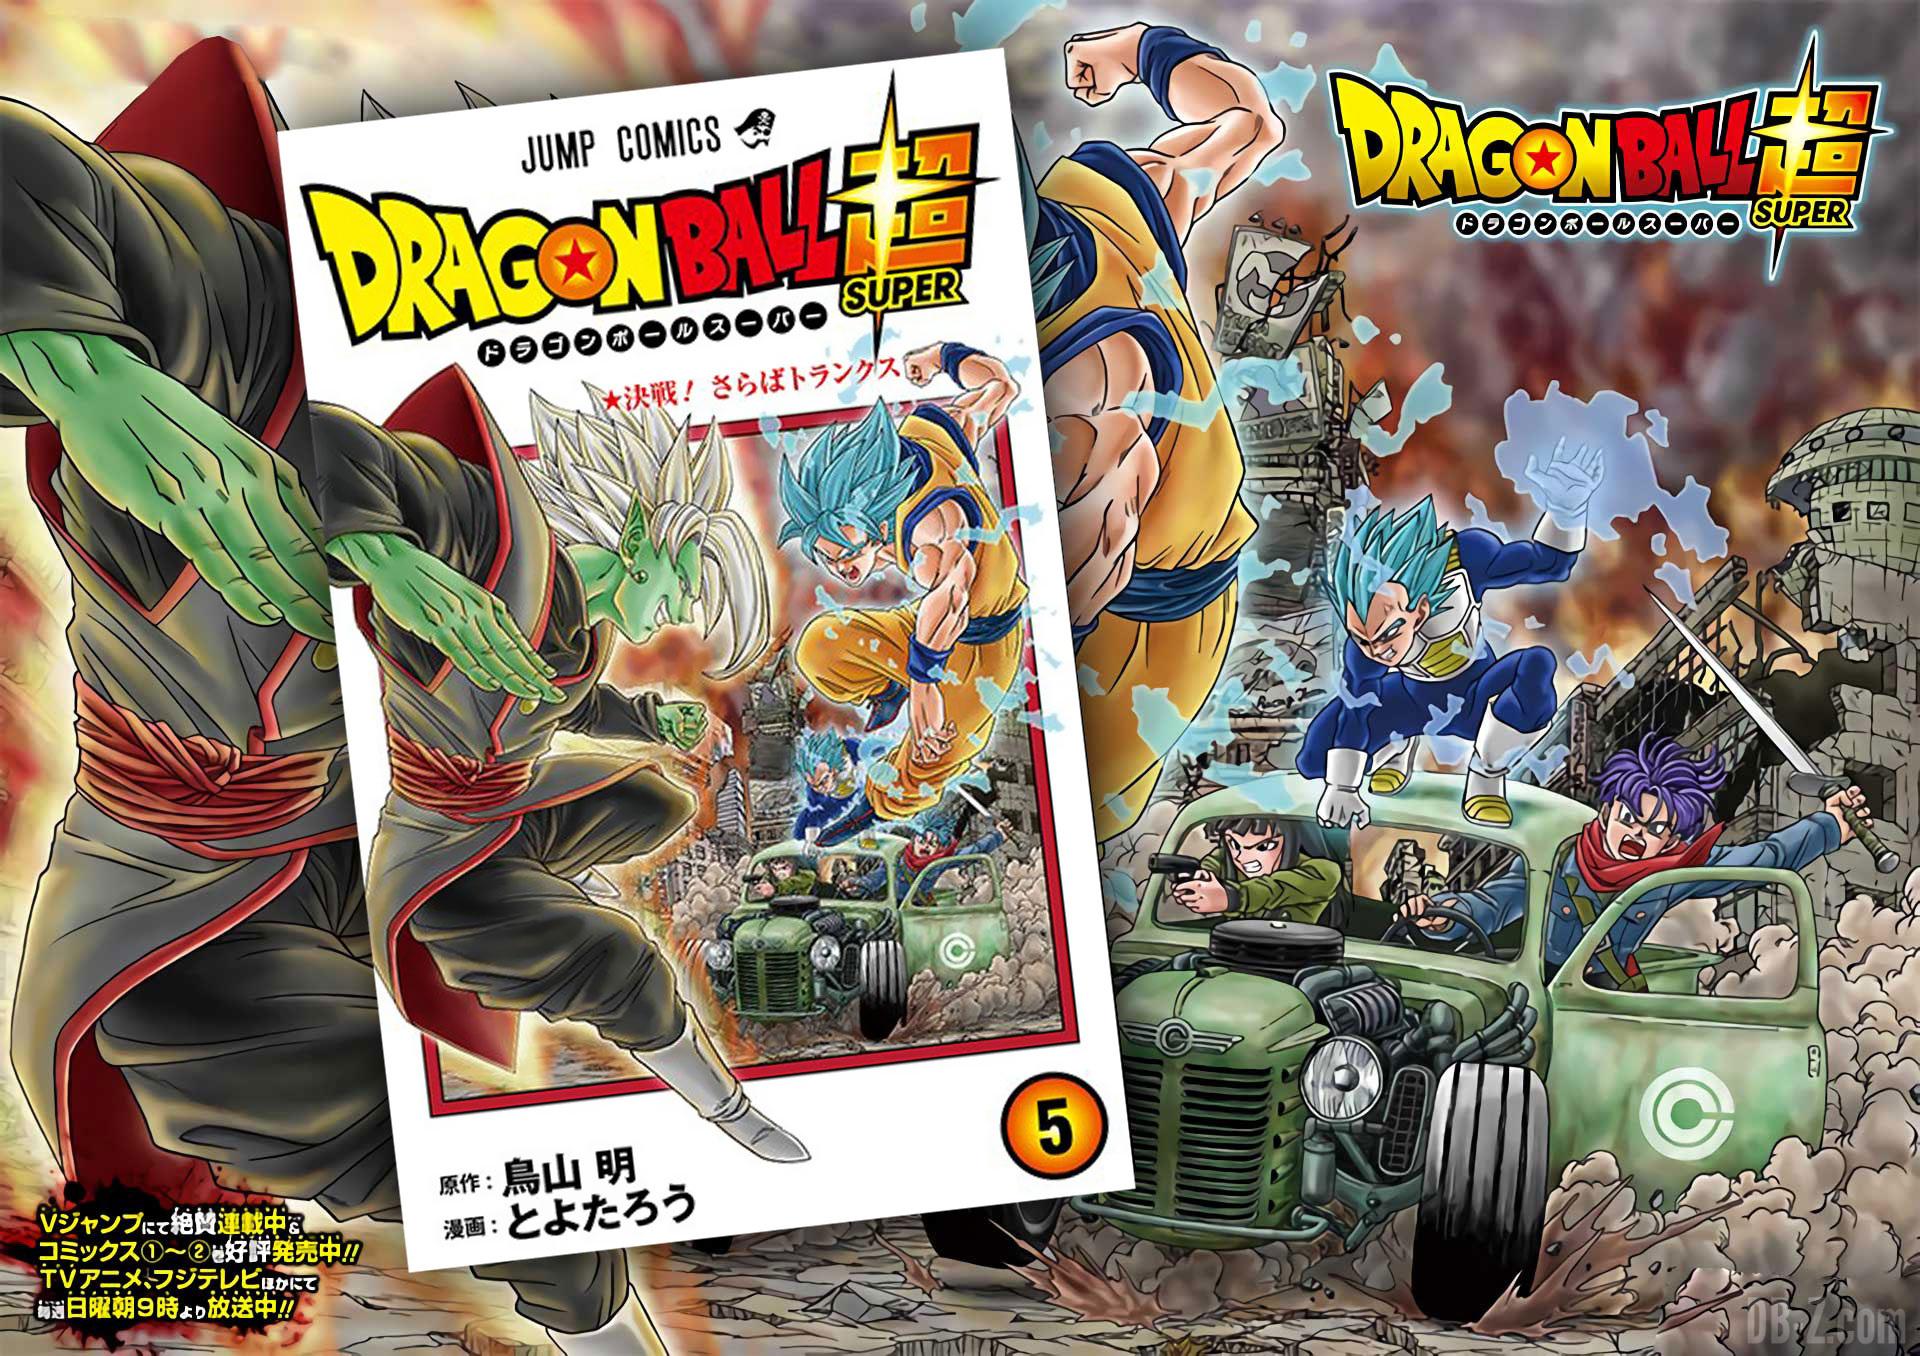 Dragon-Ball-Super-Tome-5-Cover-officiell